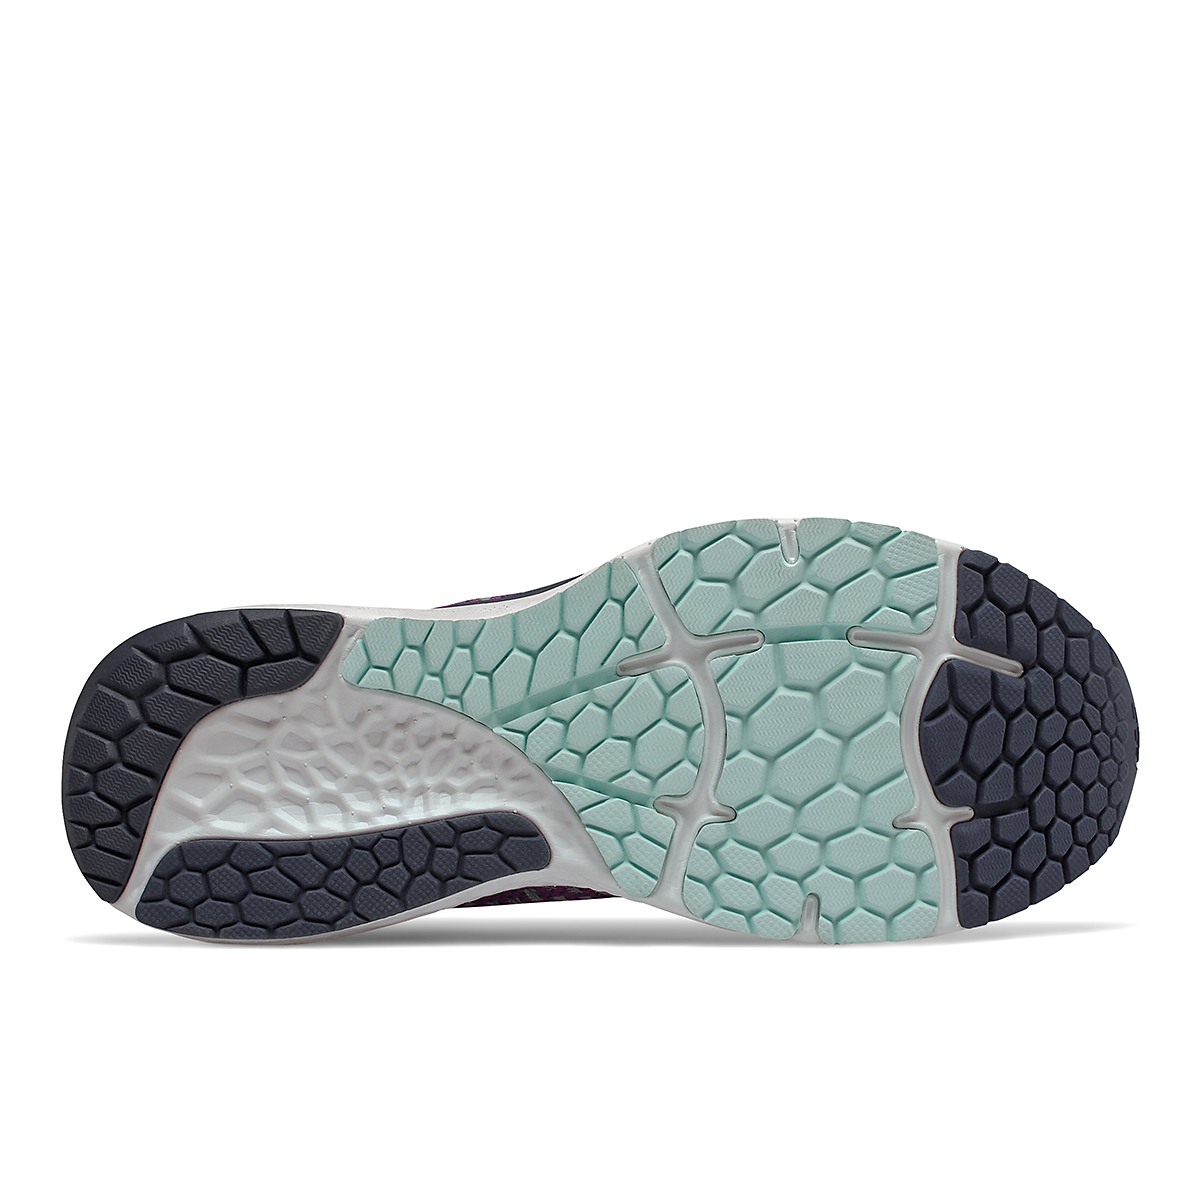 Women's New Balance 880V10 Running Shoe - Color: Plum - Size: 5 - Width: Narrow, Plum, large, image 4